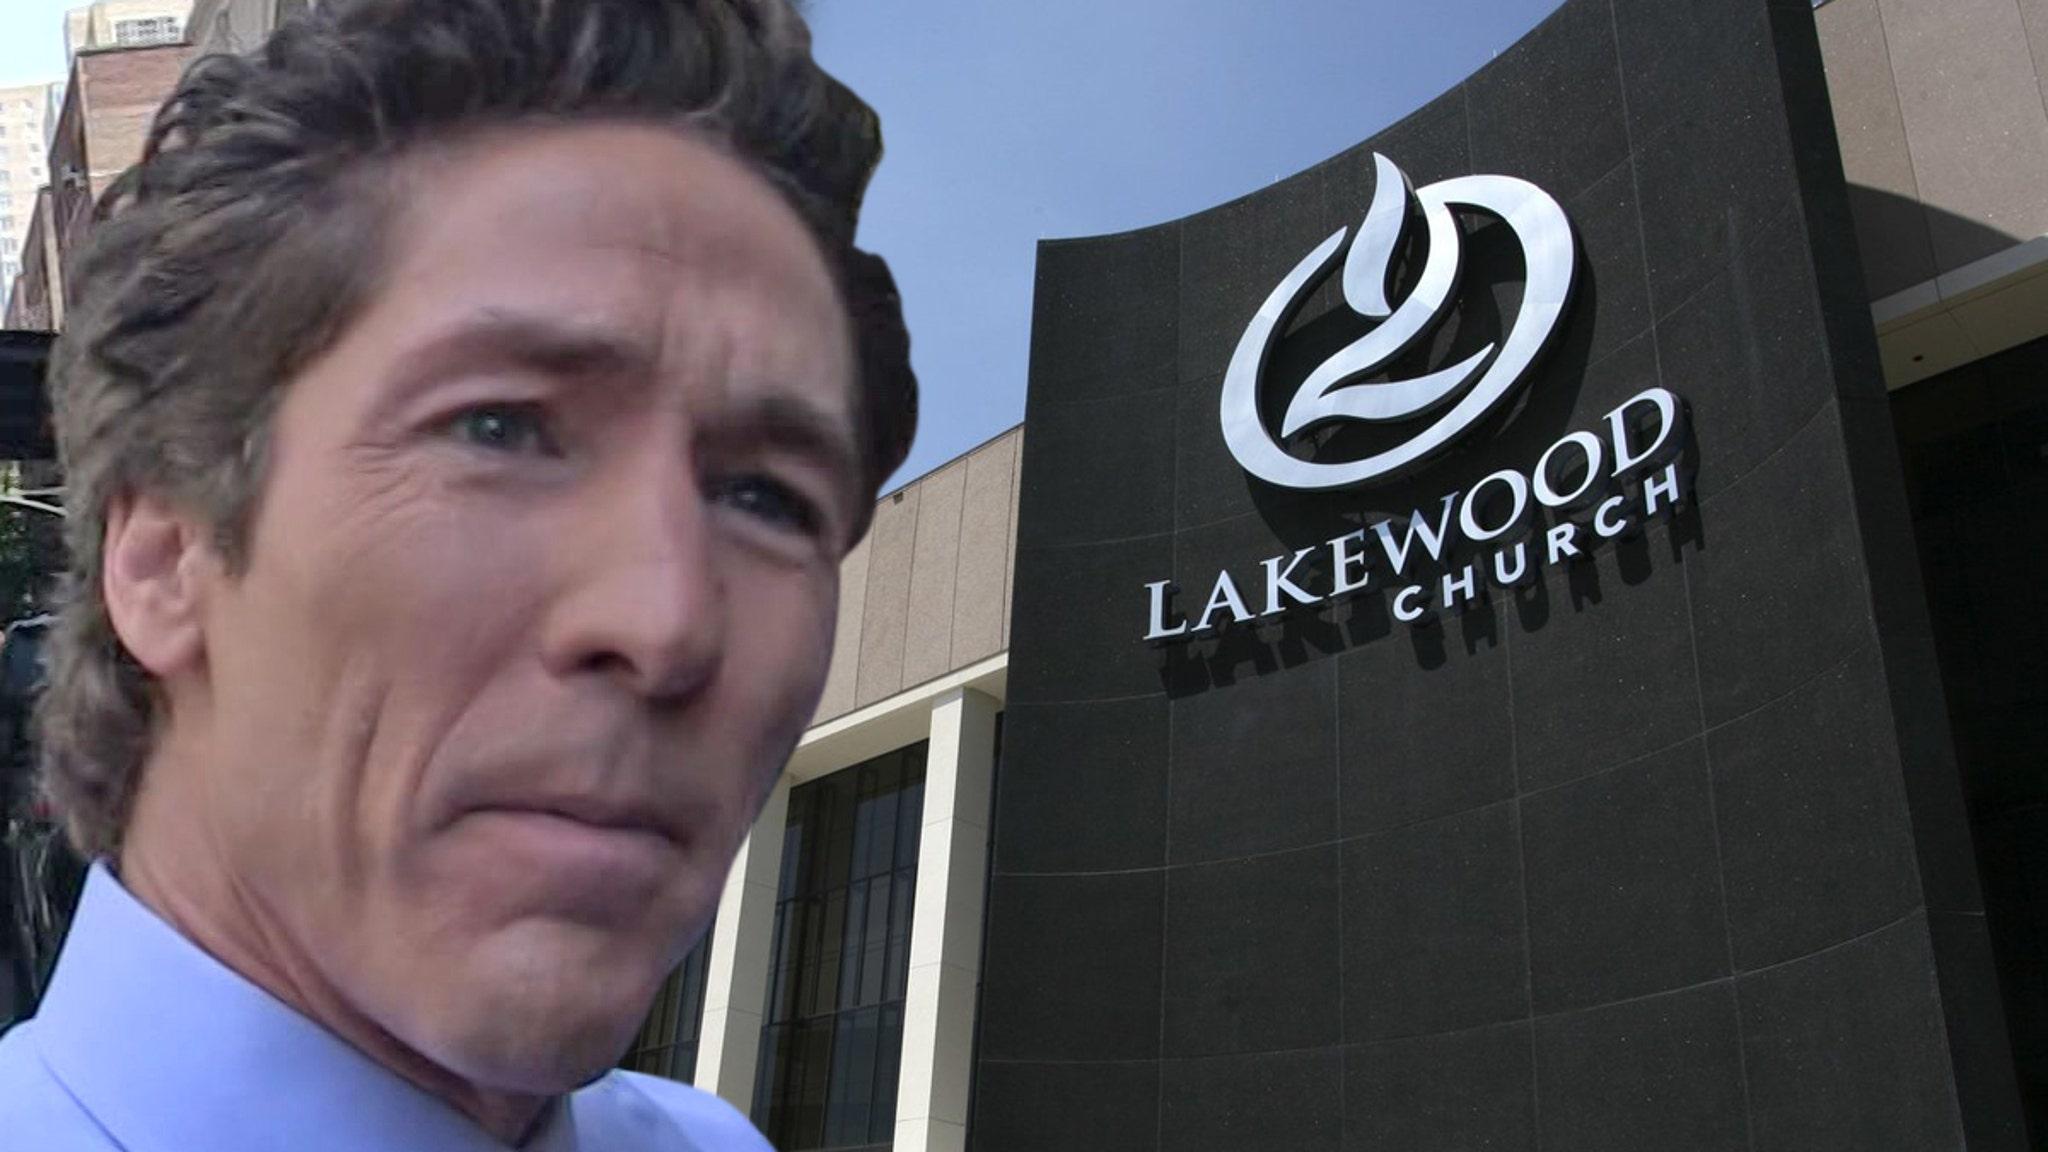 Joel Osteen's Megachurch Services Not Canceling Amid Coronavirus Pandemic